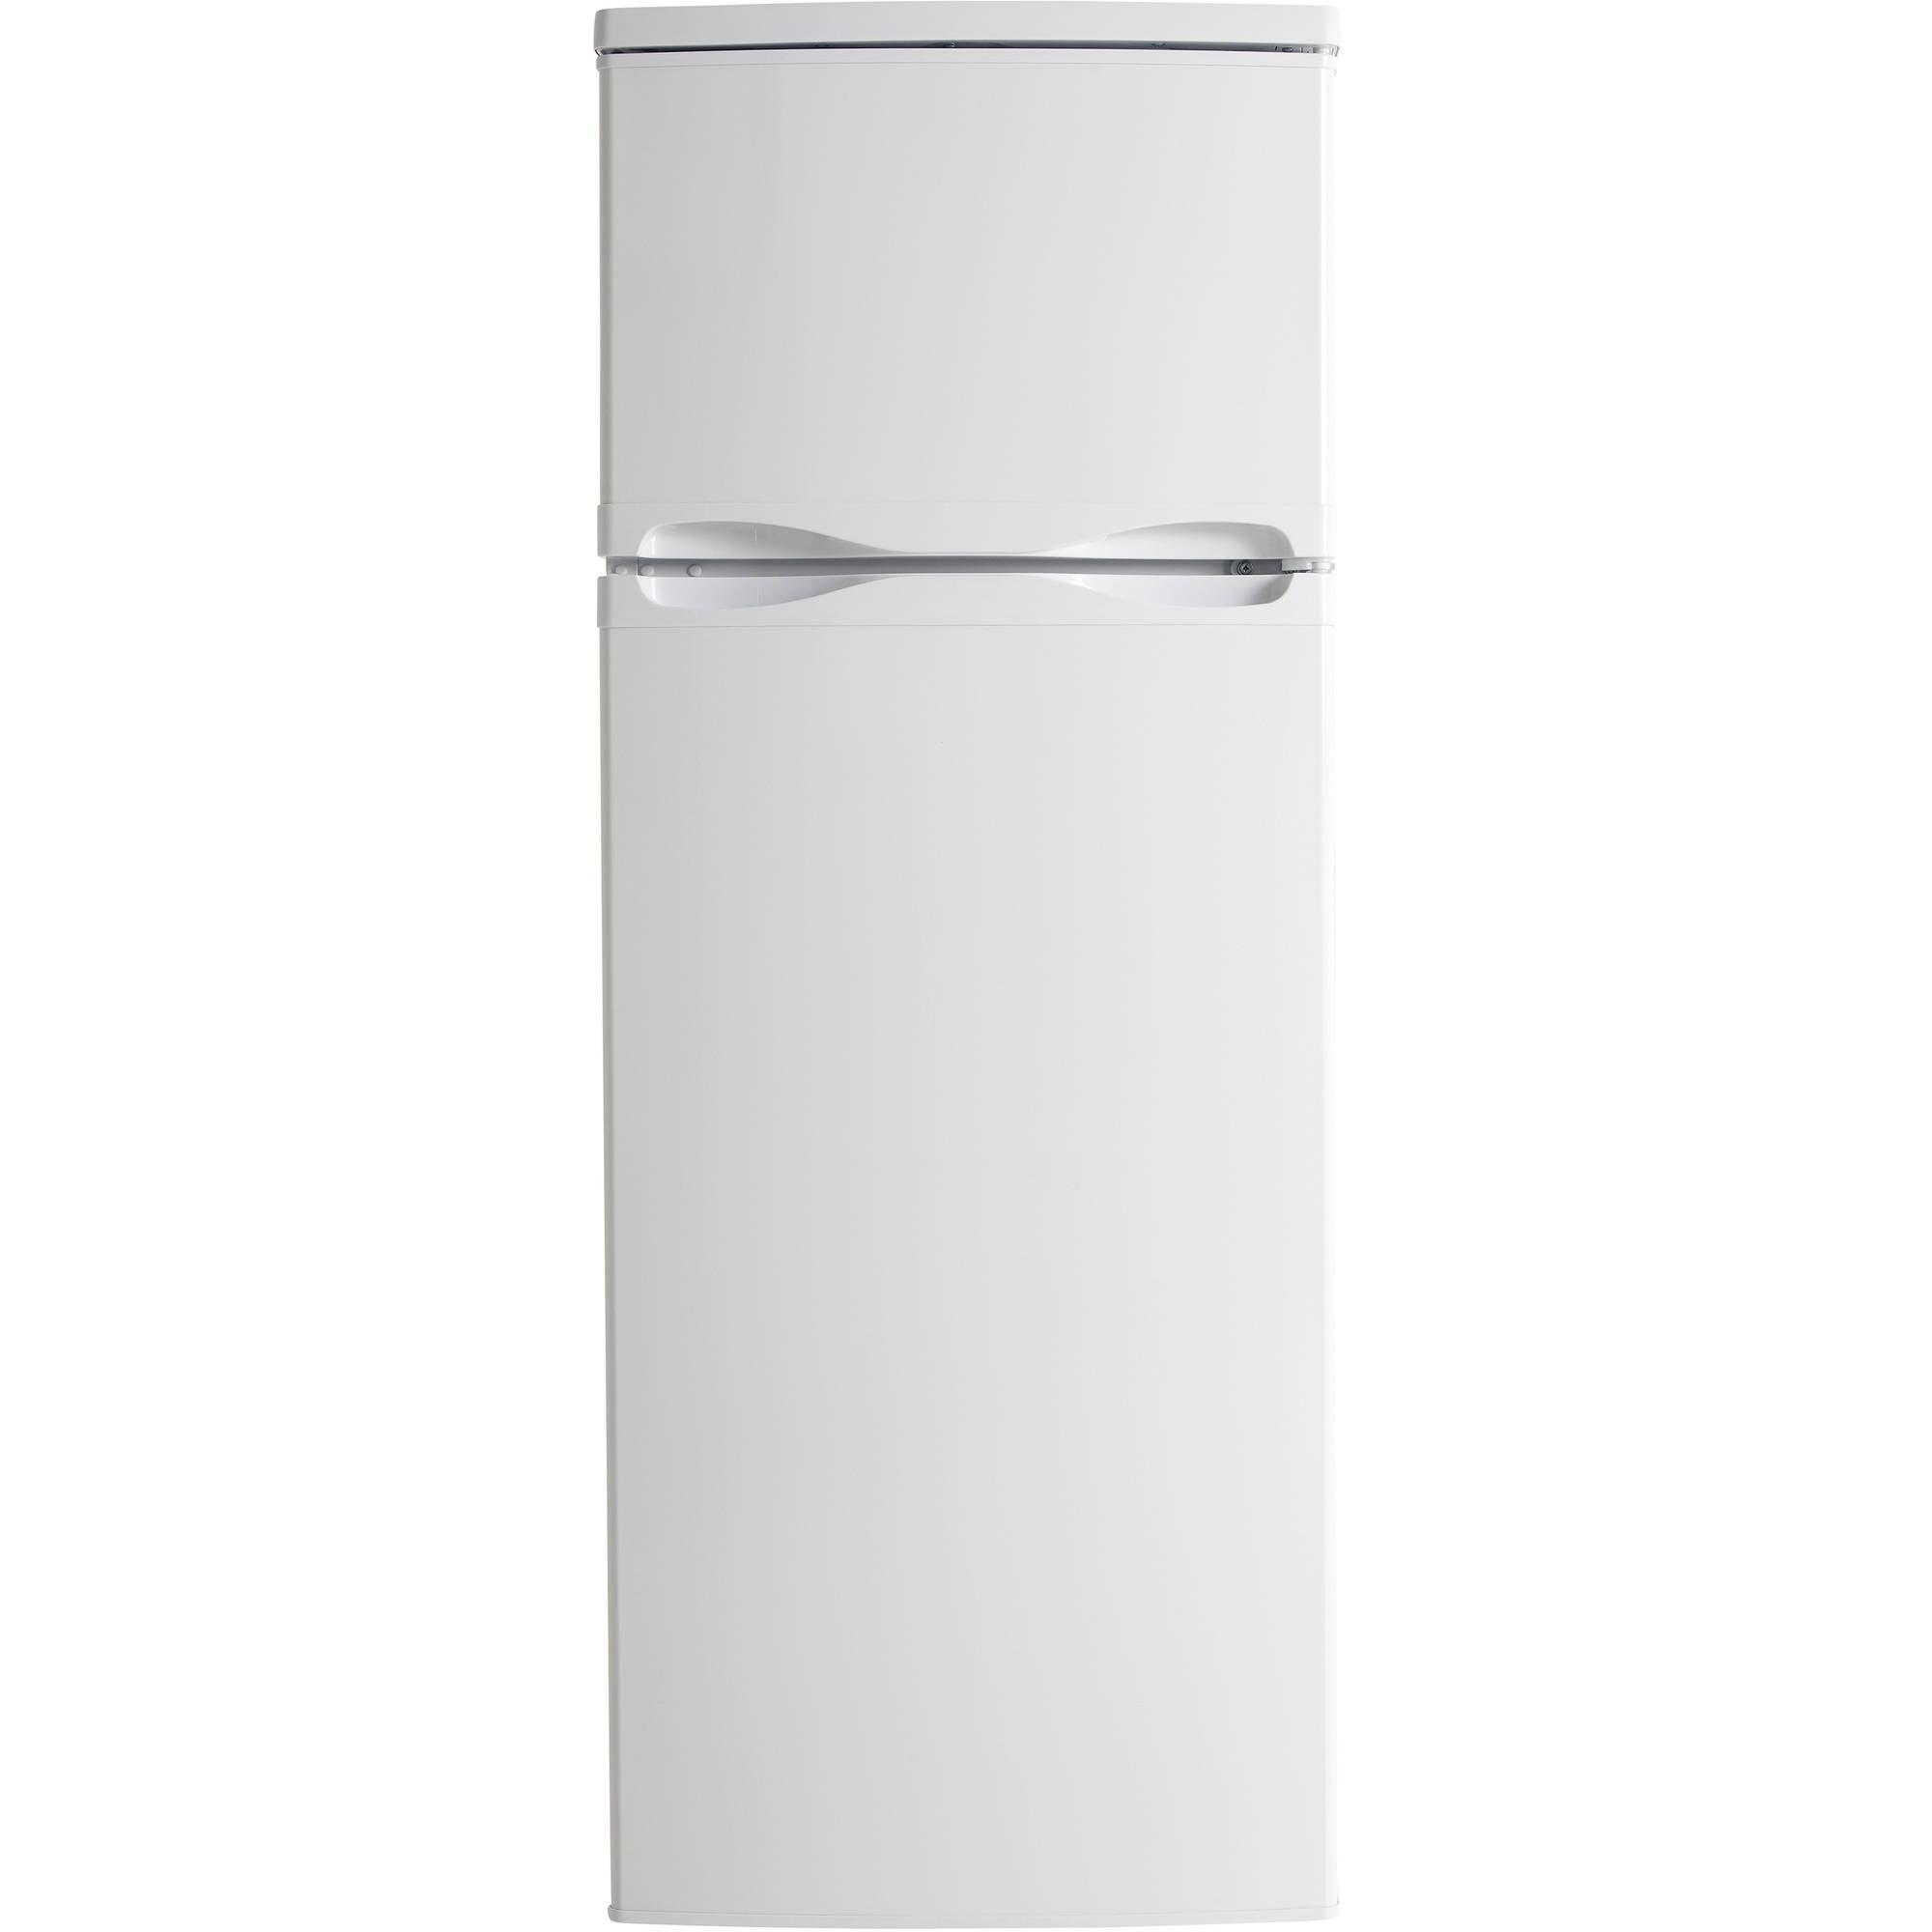 Danby 7.3 cu ft White Top Mount Refrigerator